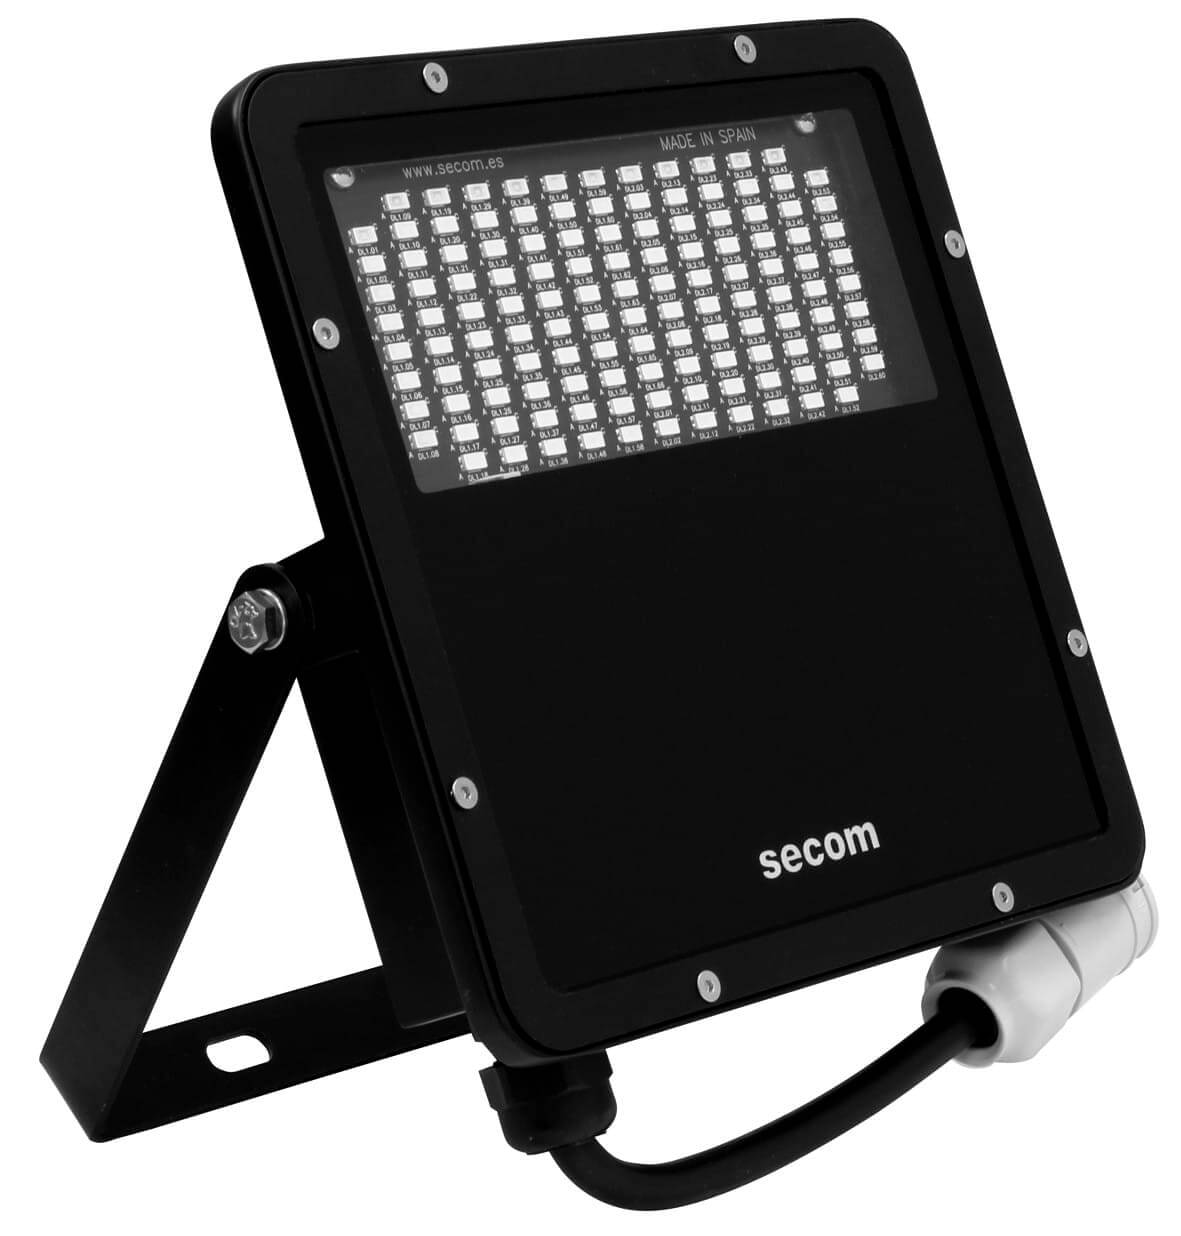 Protek LED – Protek Q2 LED – Protek Q3 LED